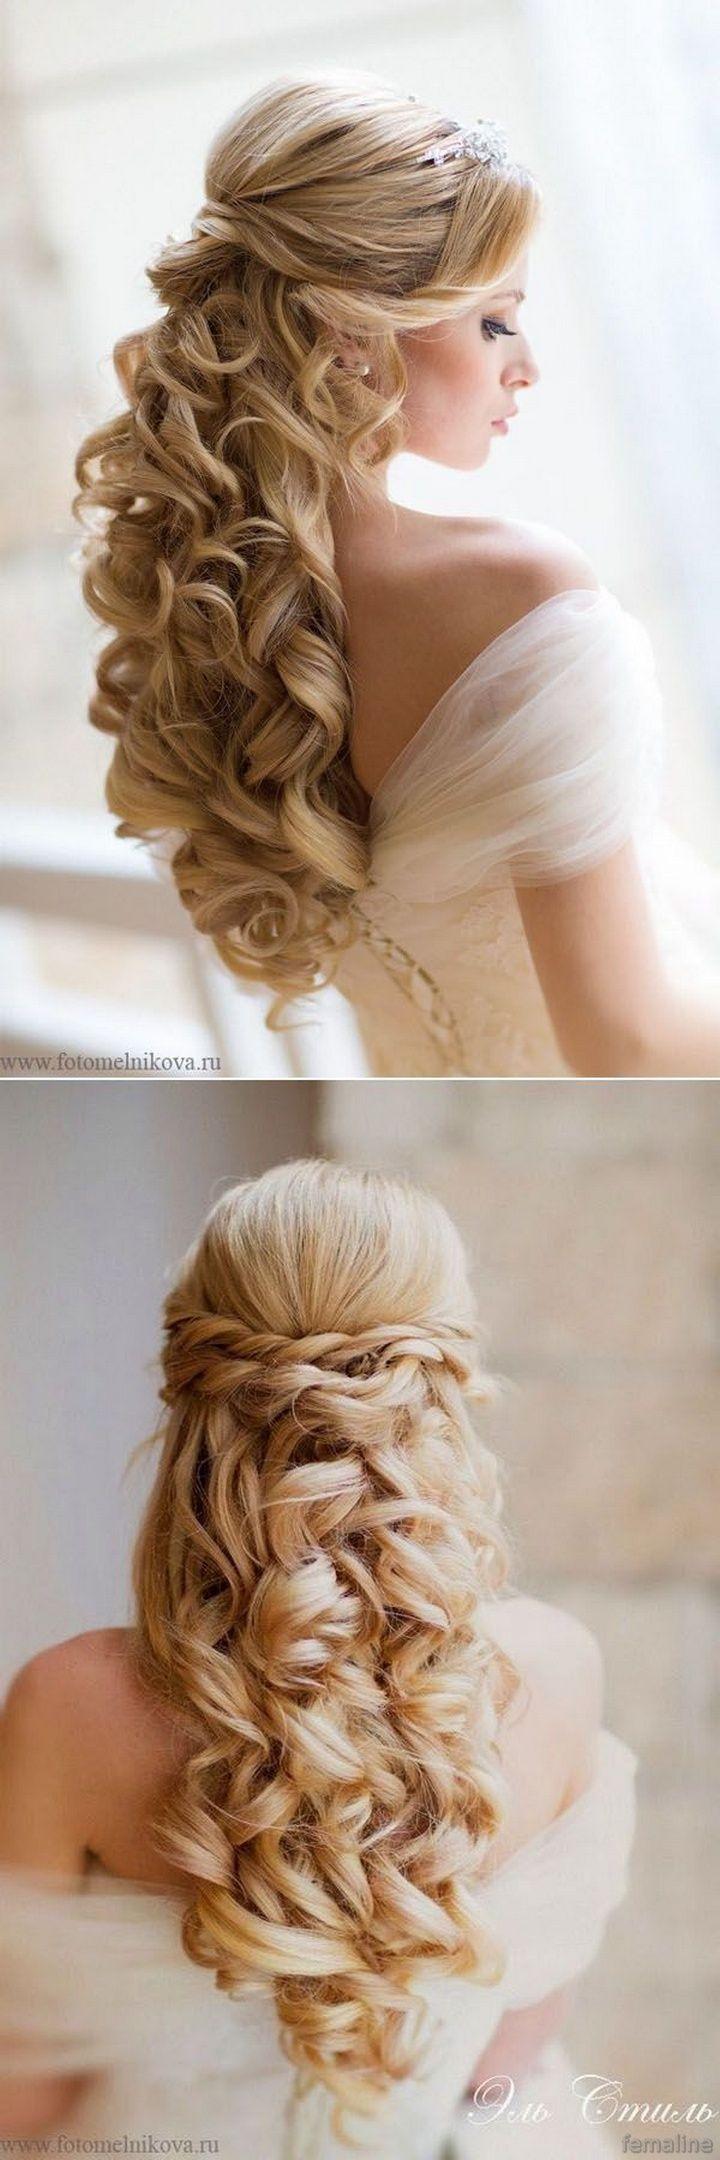 Elegant bridal hairstyles for long hair long hair hairstyles